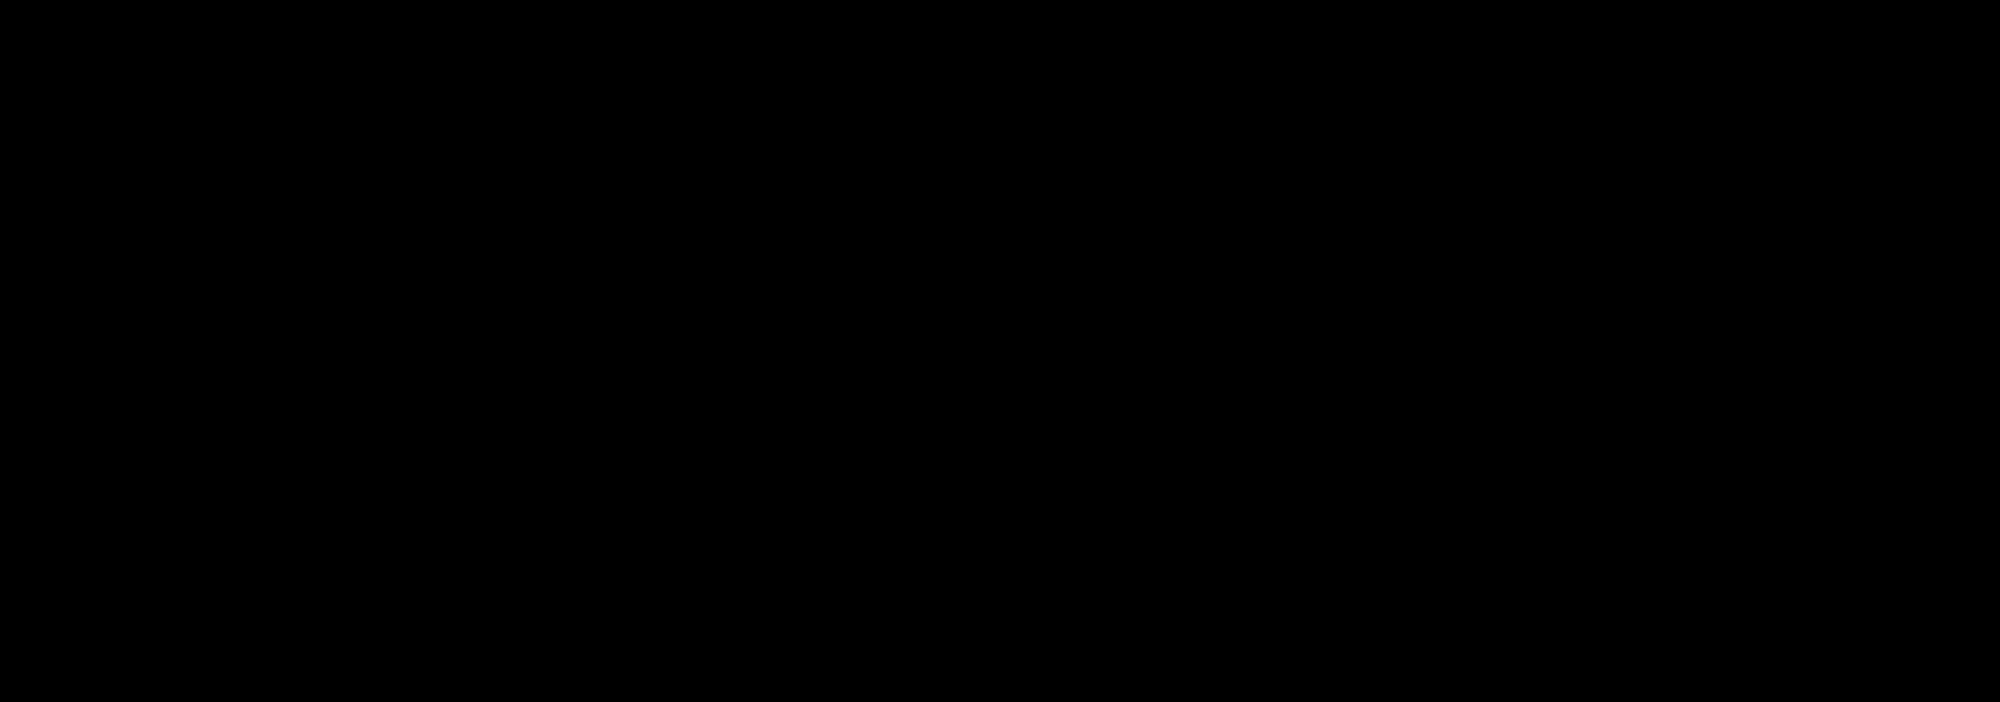 Noe Music Listening Club-logo-black.png